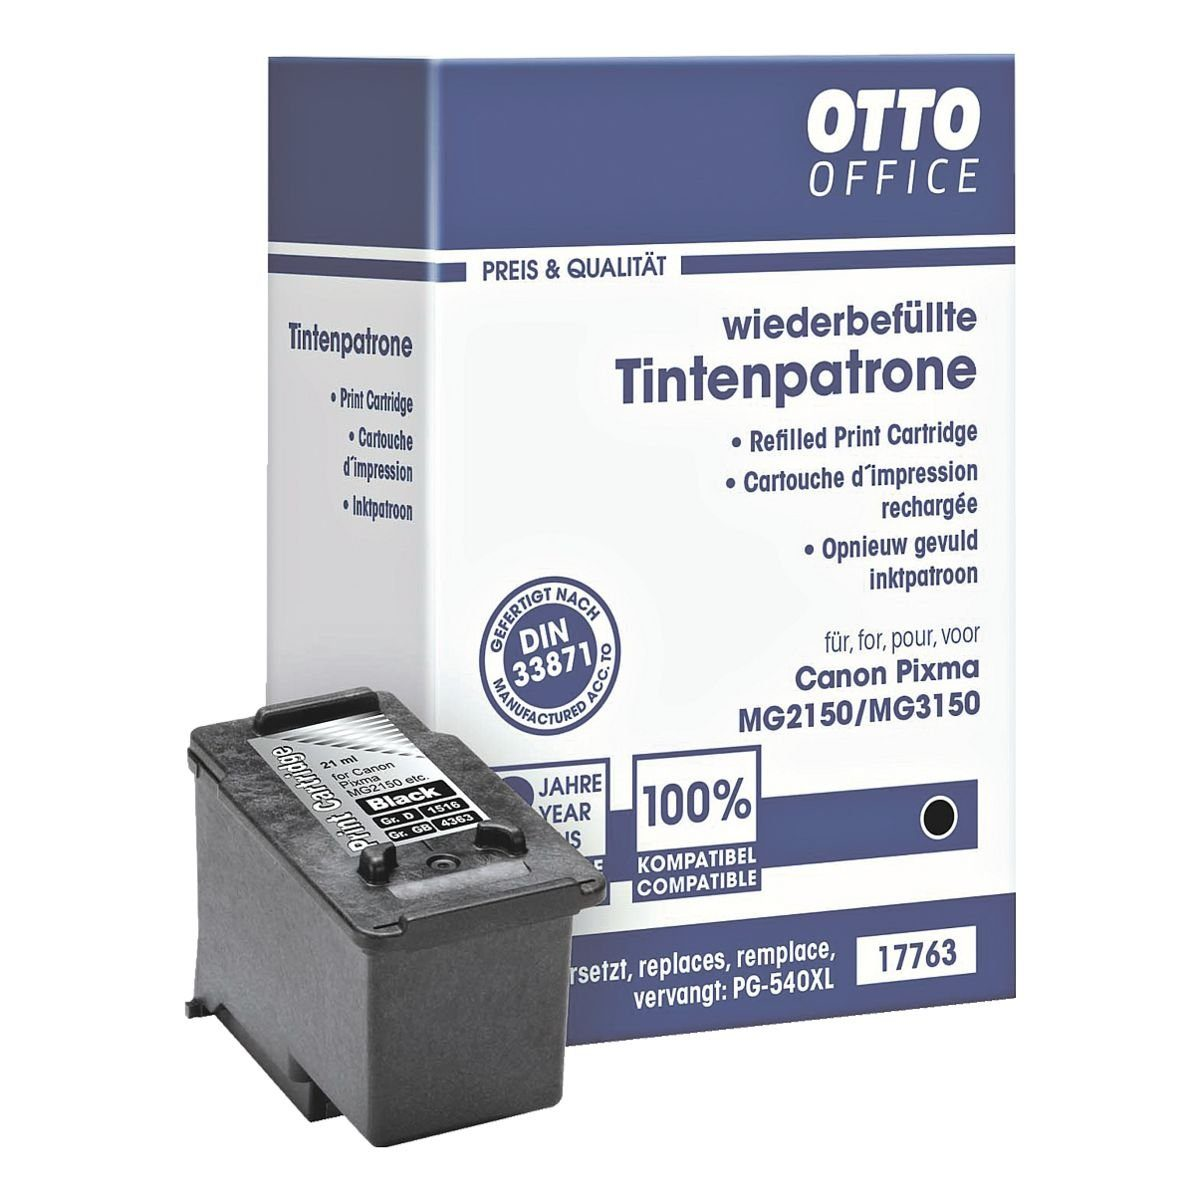 OTTO Office Standard Tintenpatrone ersetzt Canon »PG-540XL«